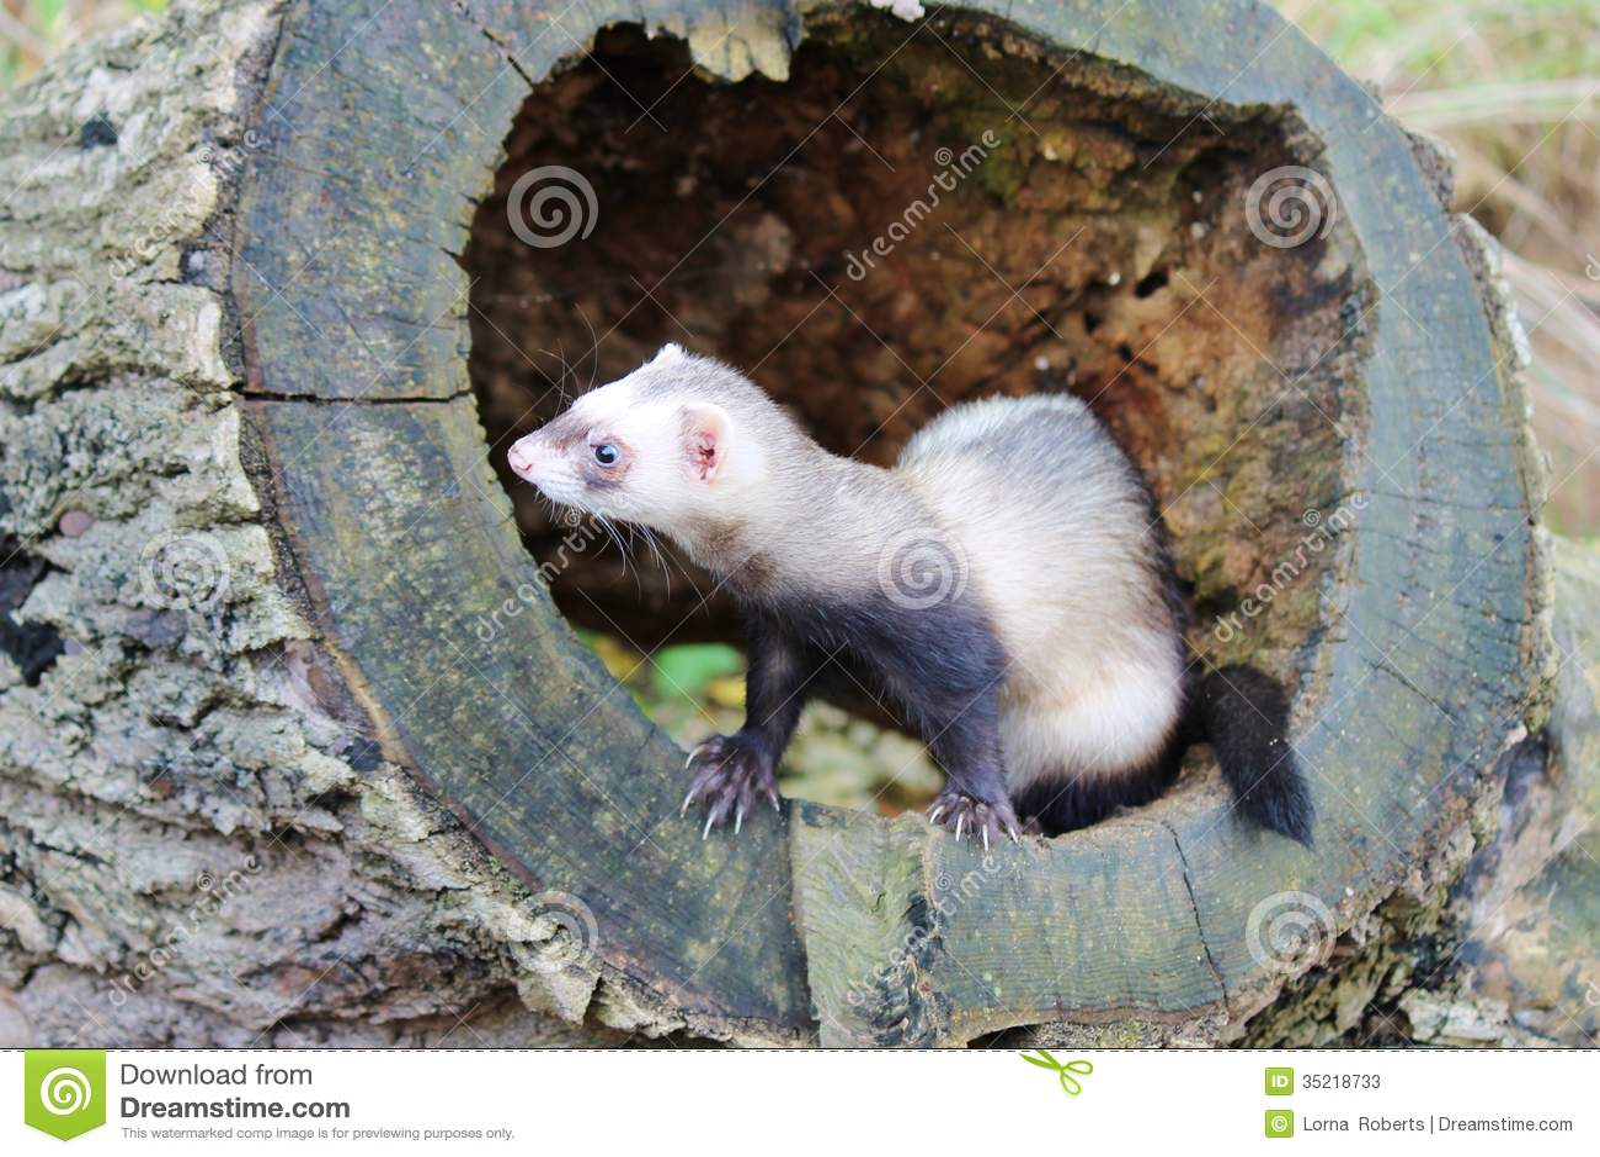 Ferret On Tree Stump Stock Photos - Image: 35218733 | 1300 x 957 jpeg 168kB